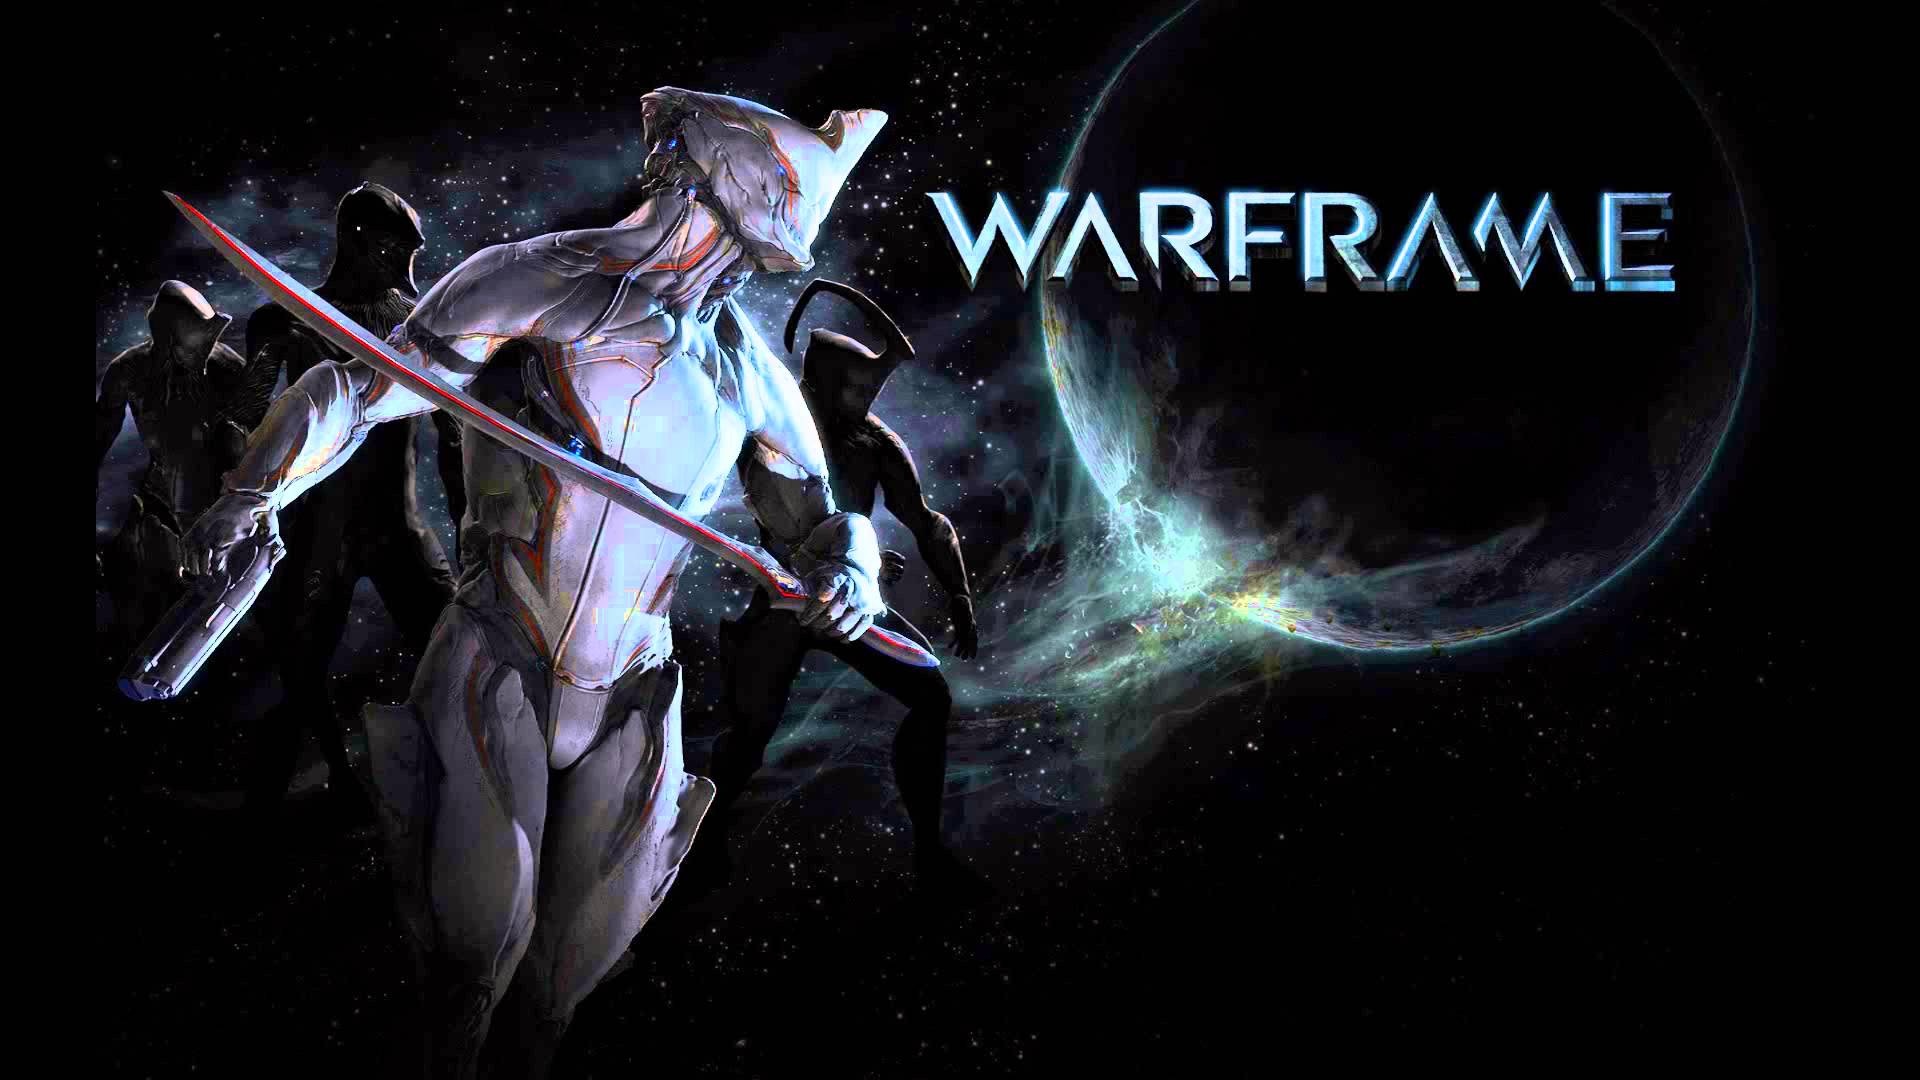 Ater Dracones - klan Warframe